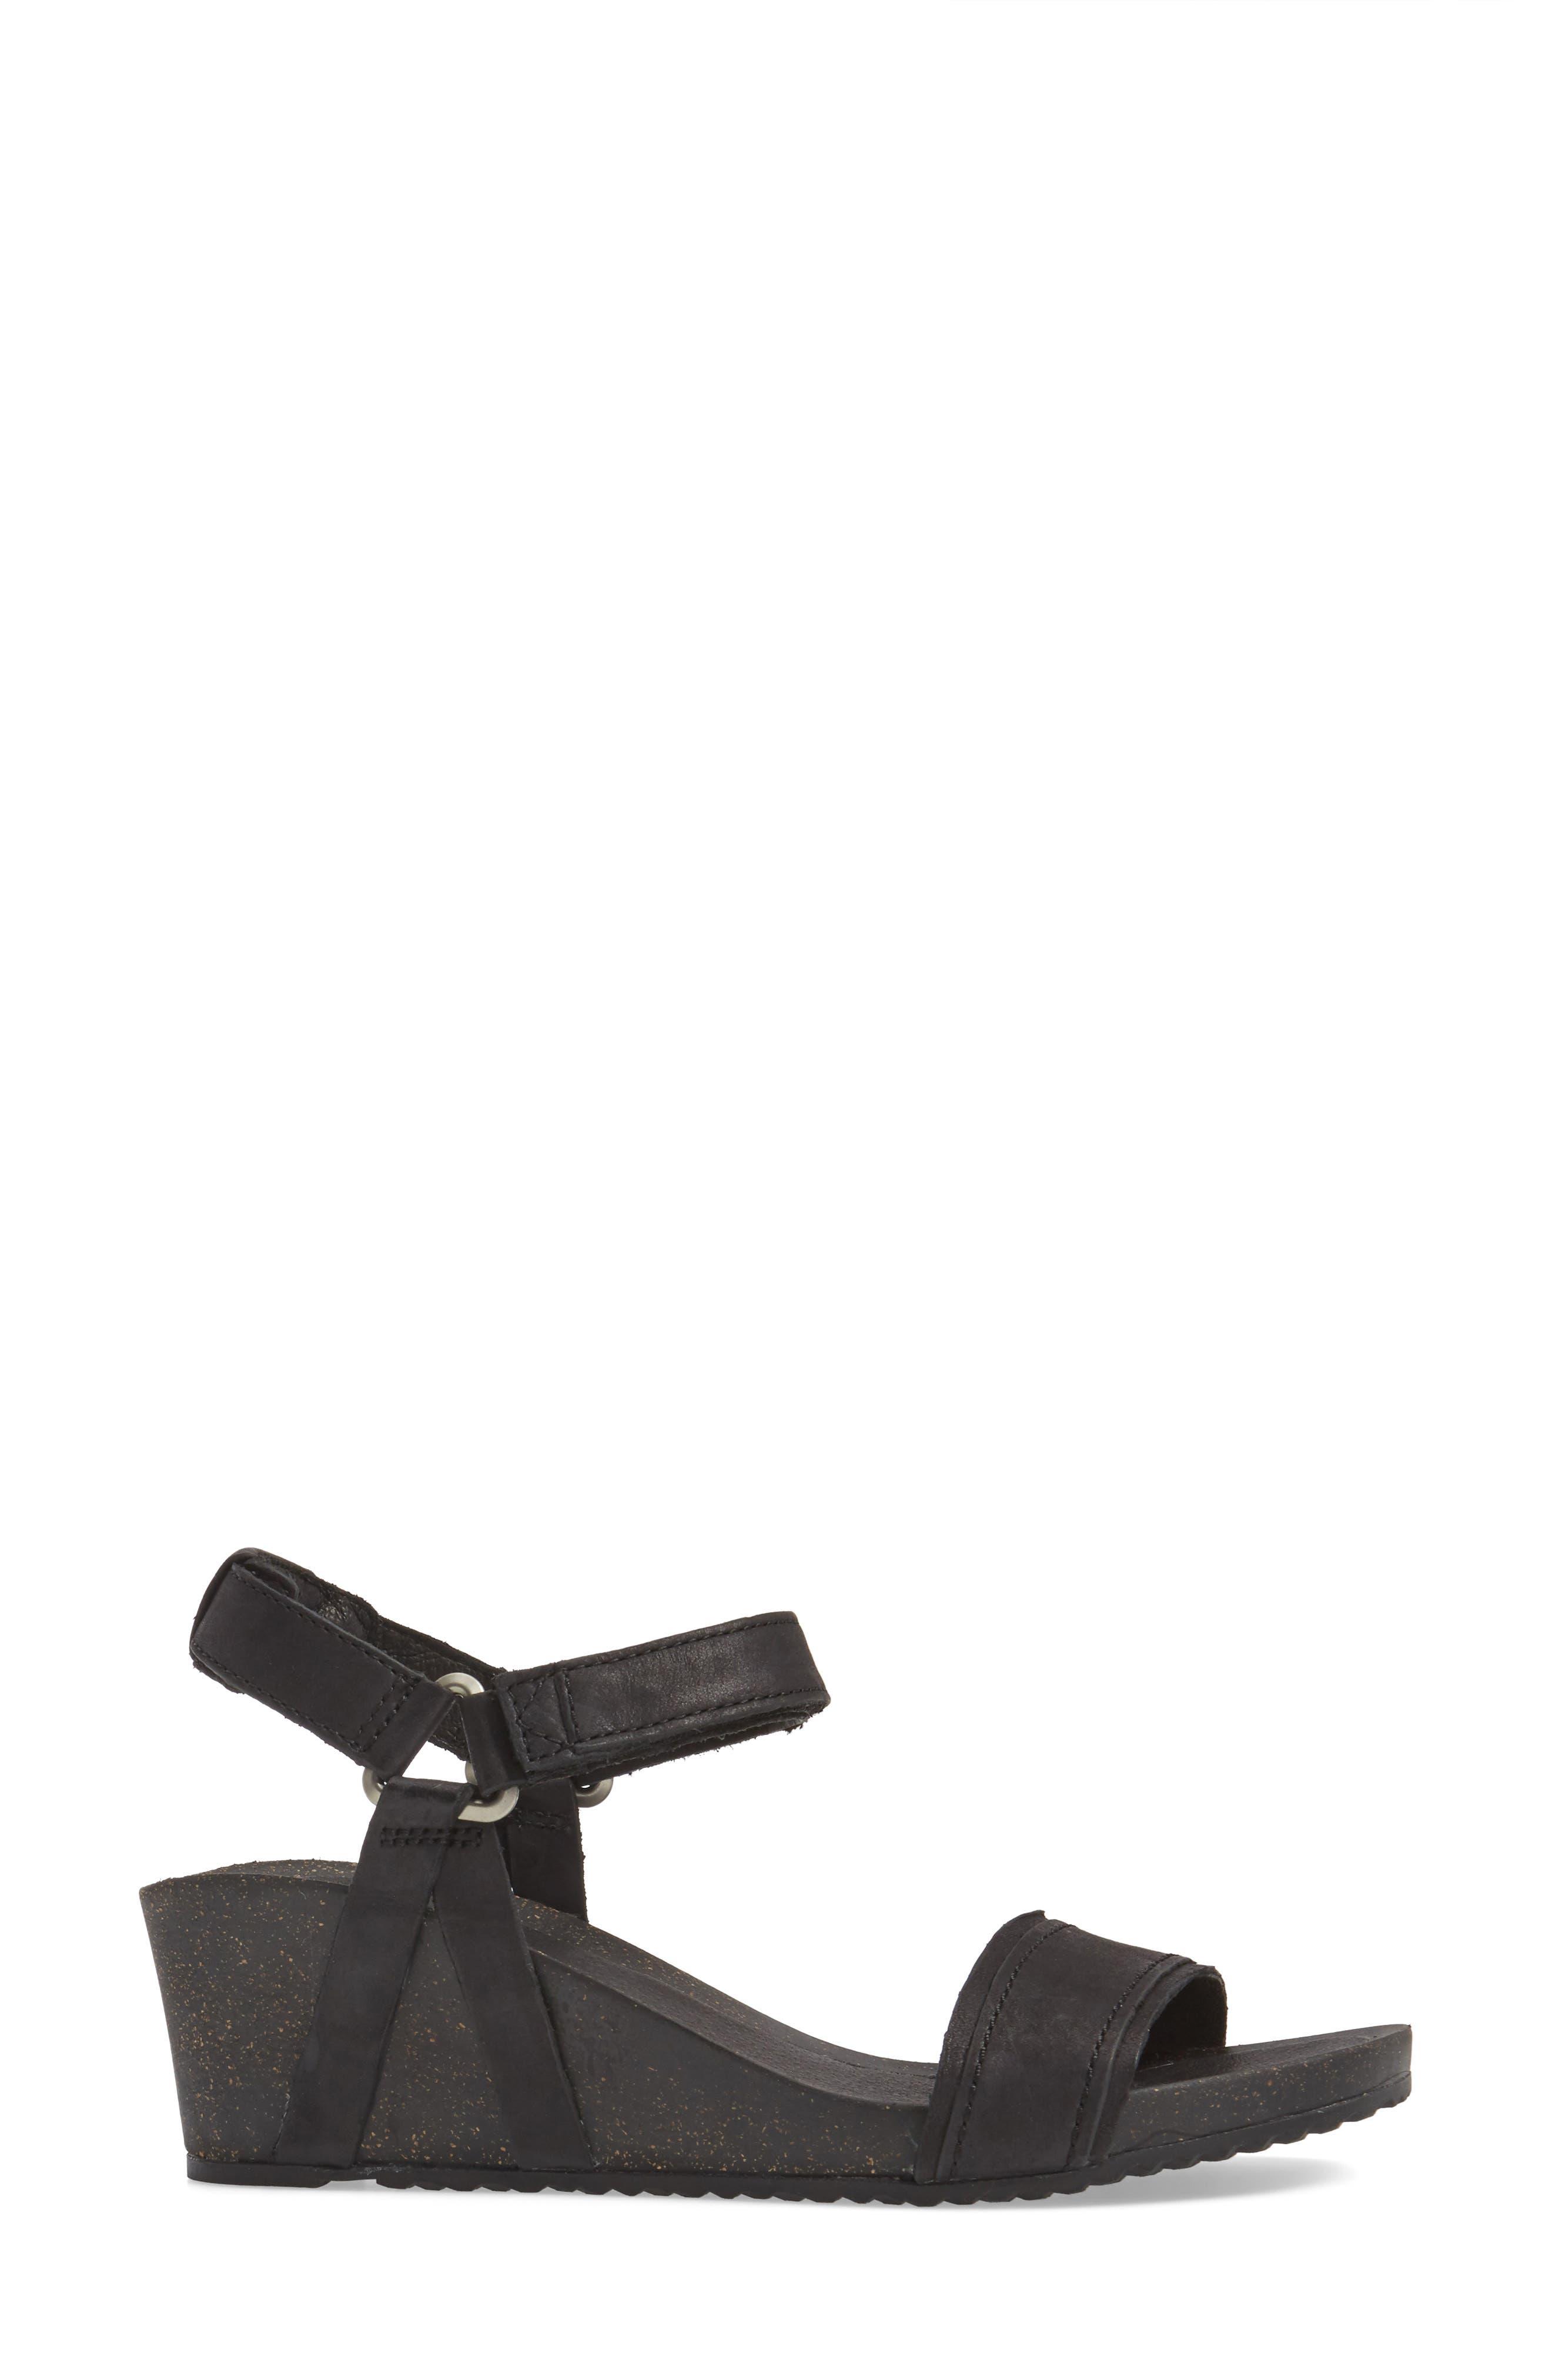 Ysidro Stitch Wedge Sandal,                             Alternate thumbnail 3, color,                             Black Leather